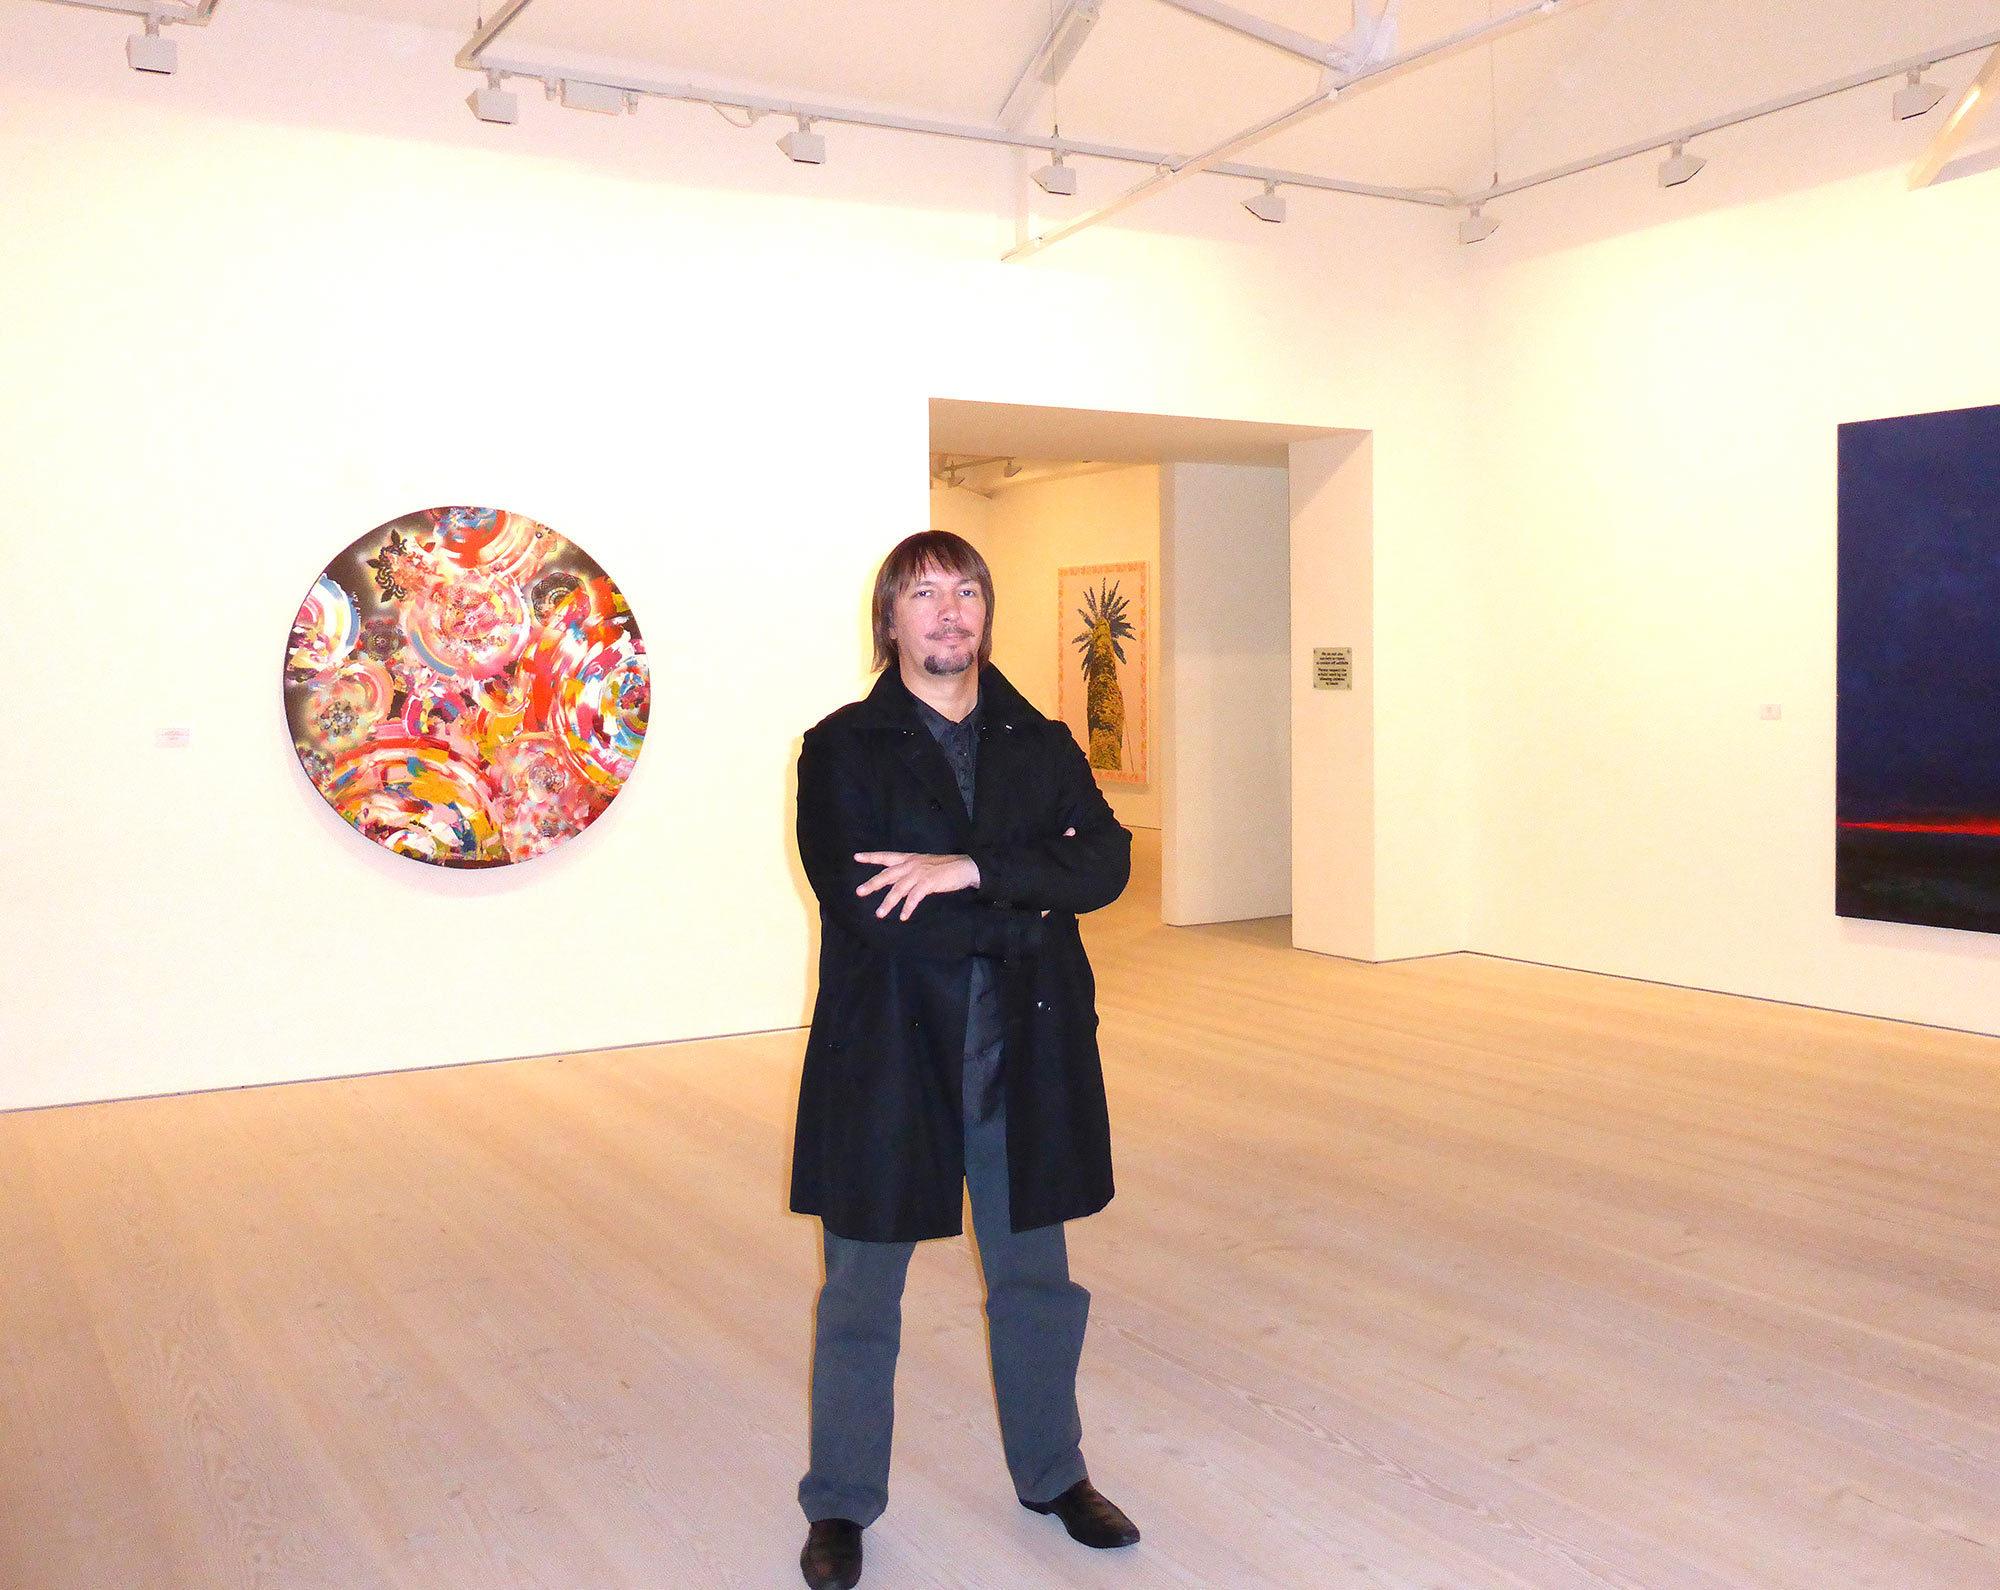 Saatchi Gallery. London